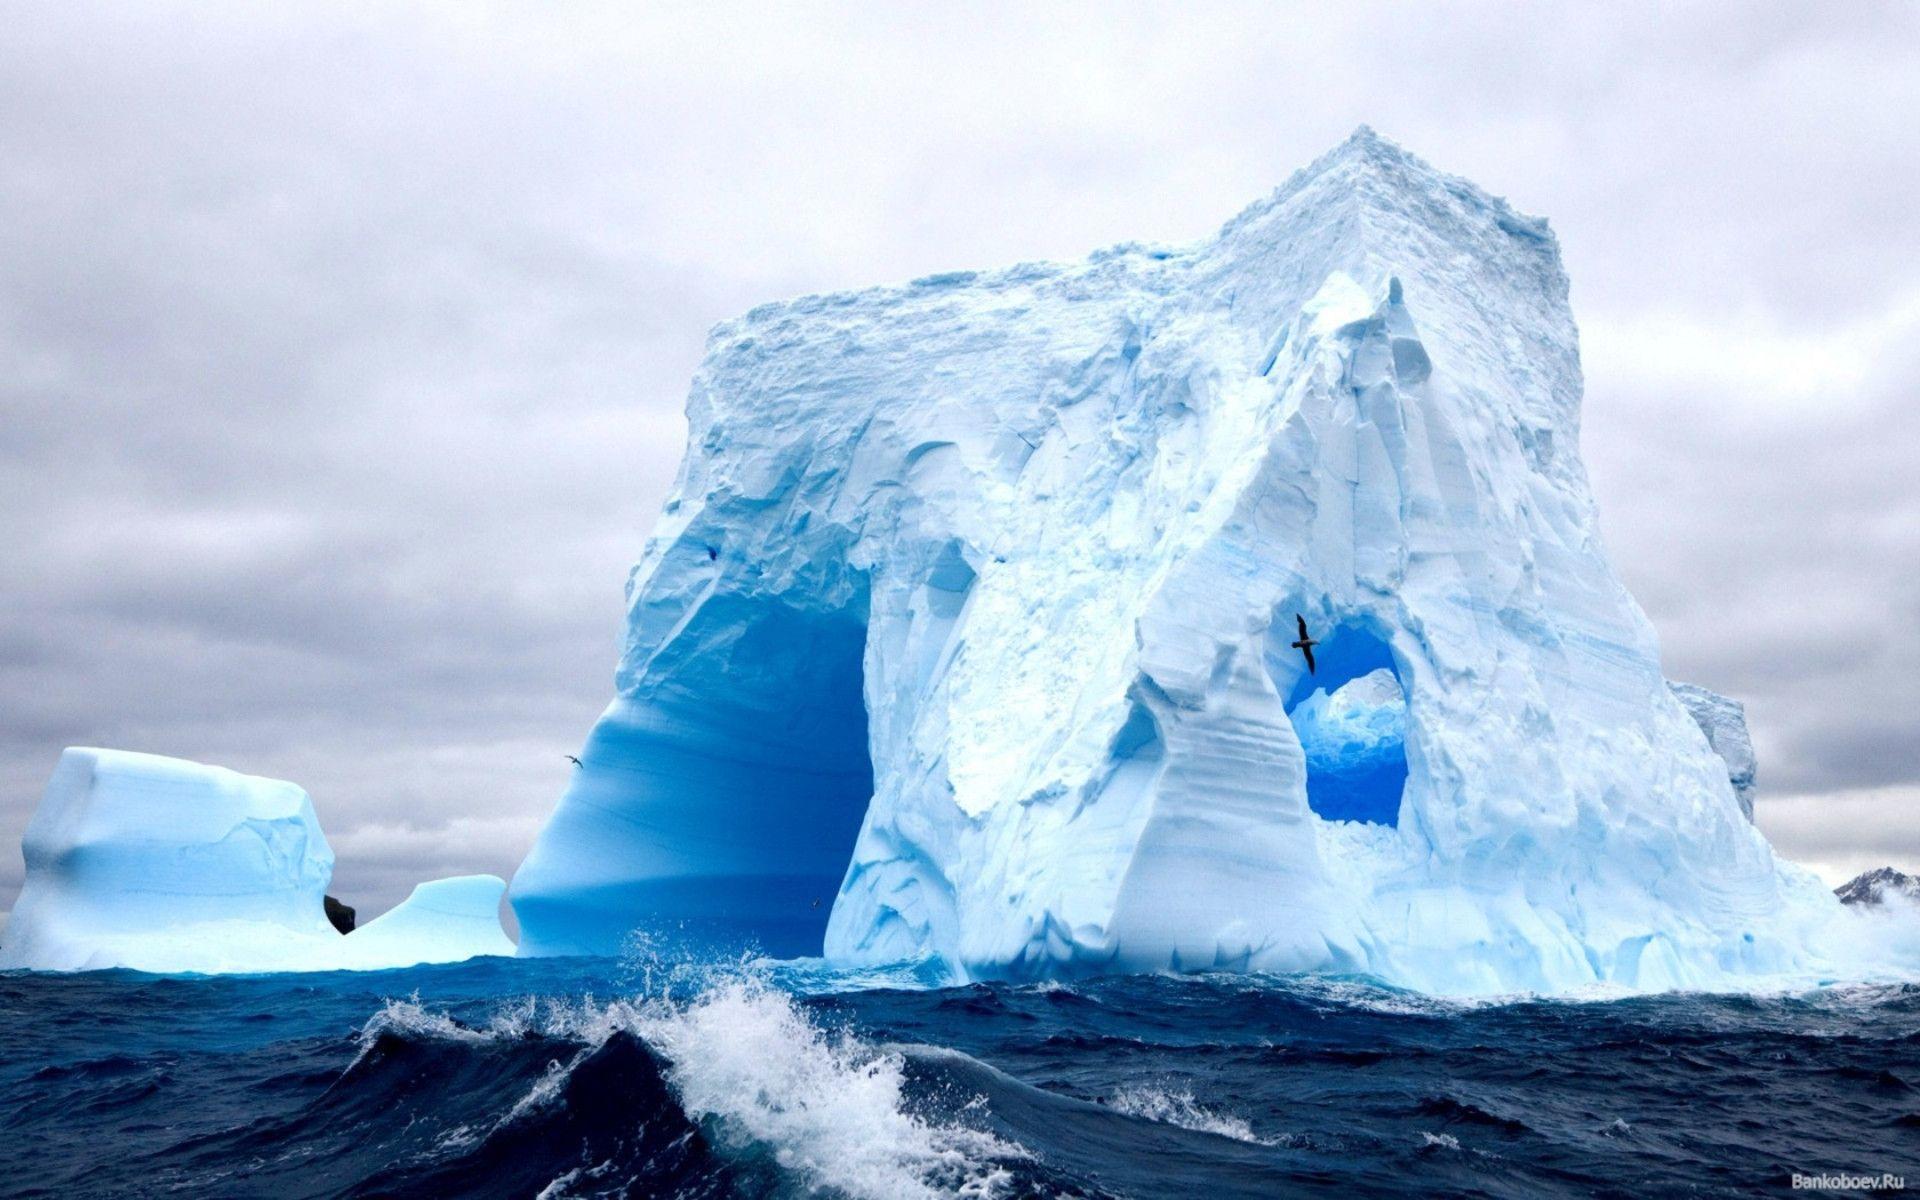 white hd iceberg image